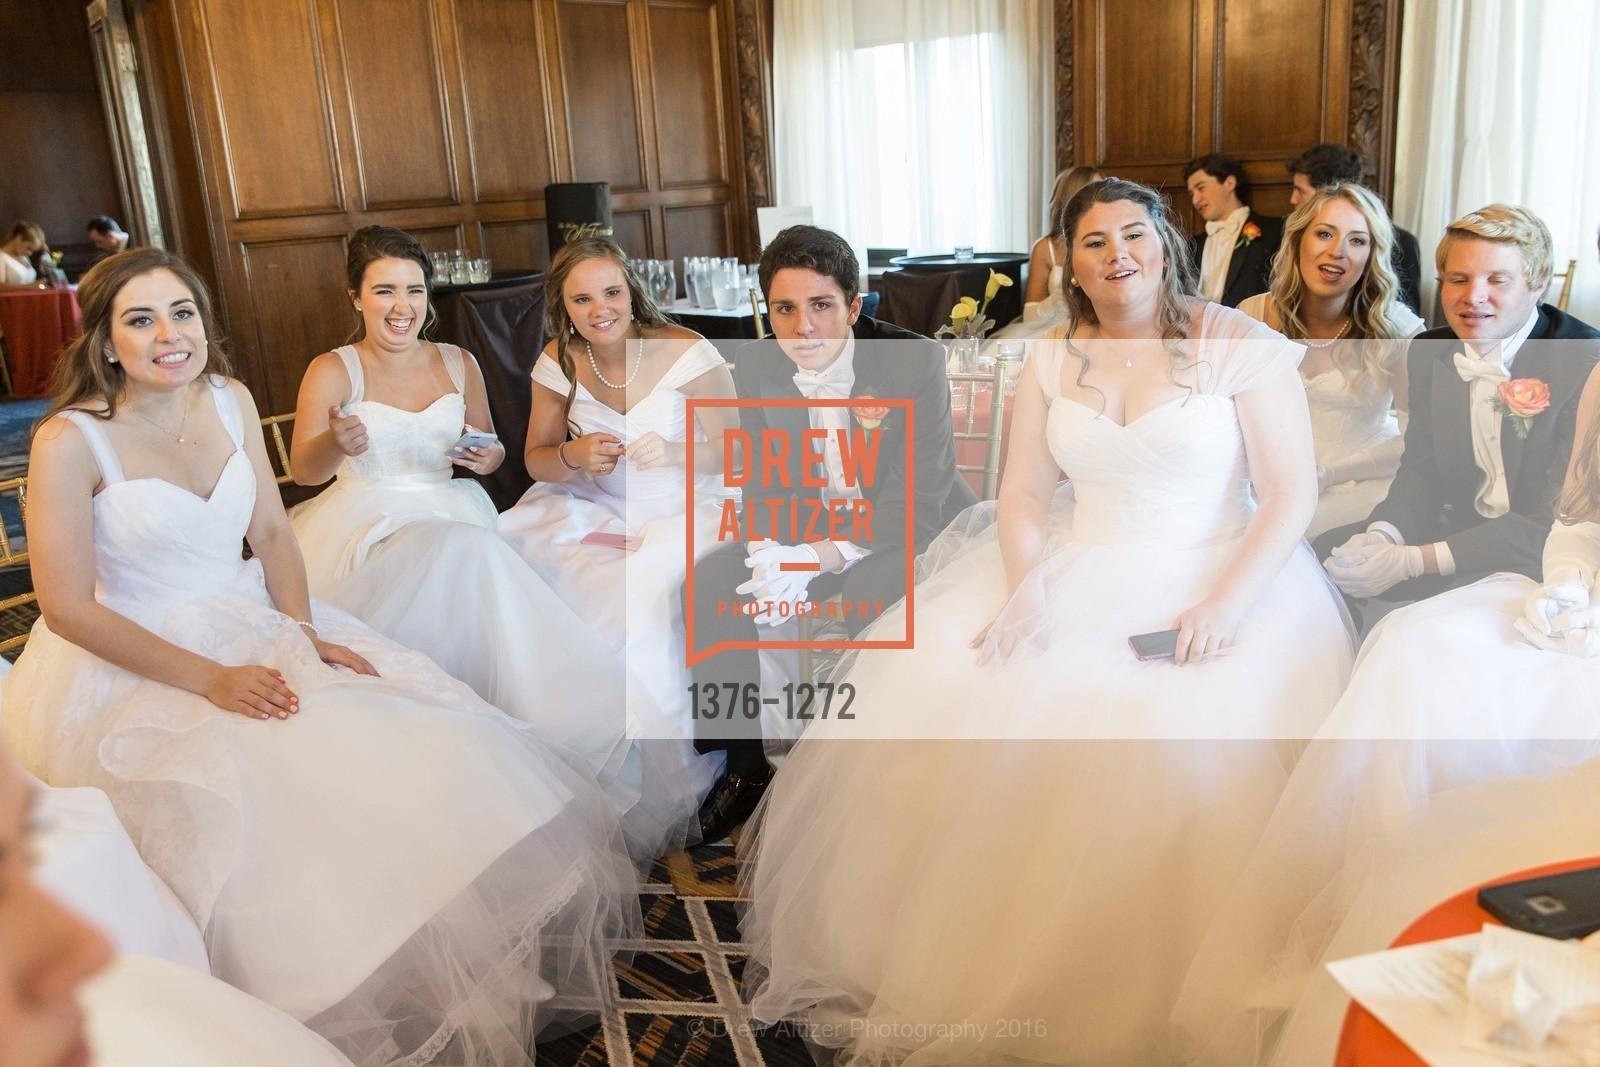 Anna Garman, Catherine Ann Bick, Hart Ayoob, Casey Mathews, Madeline Kuhn, Spencer Zeff, Photo #1376-1272